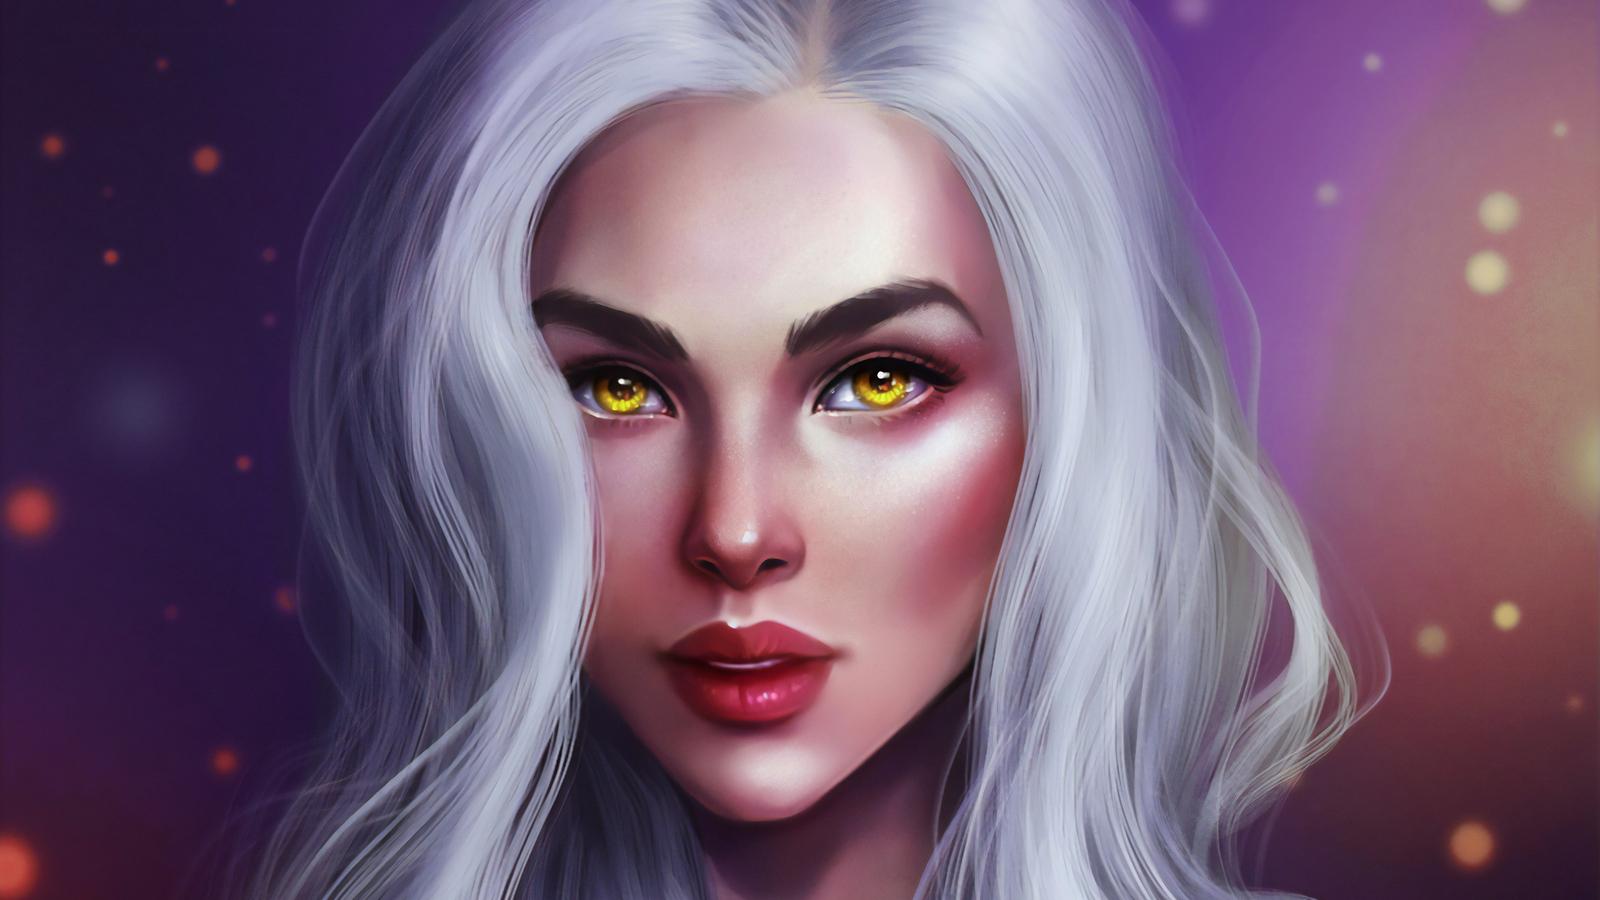 golden-eyes-fantasy-girl-xm.jpg